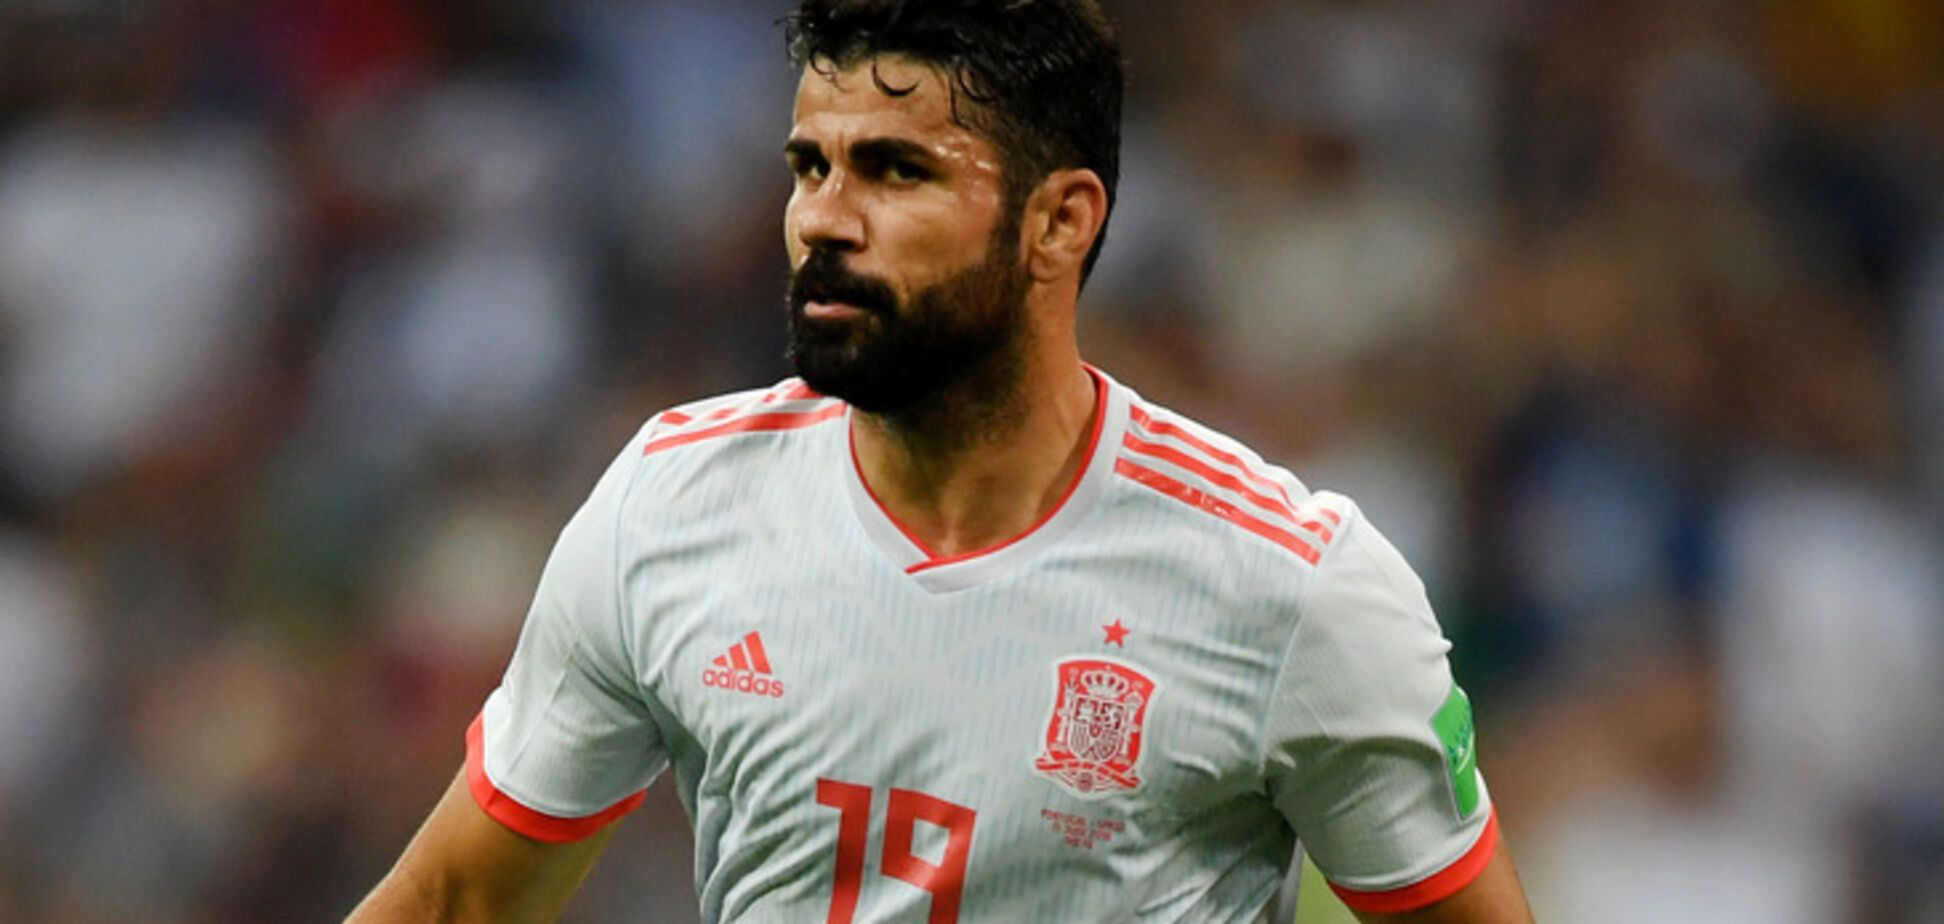 Иран - Испания: где смотреть, прогноз на матч ЧМ-2018